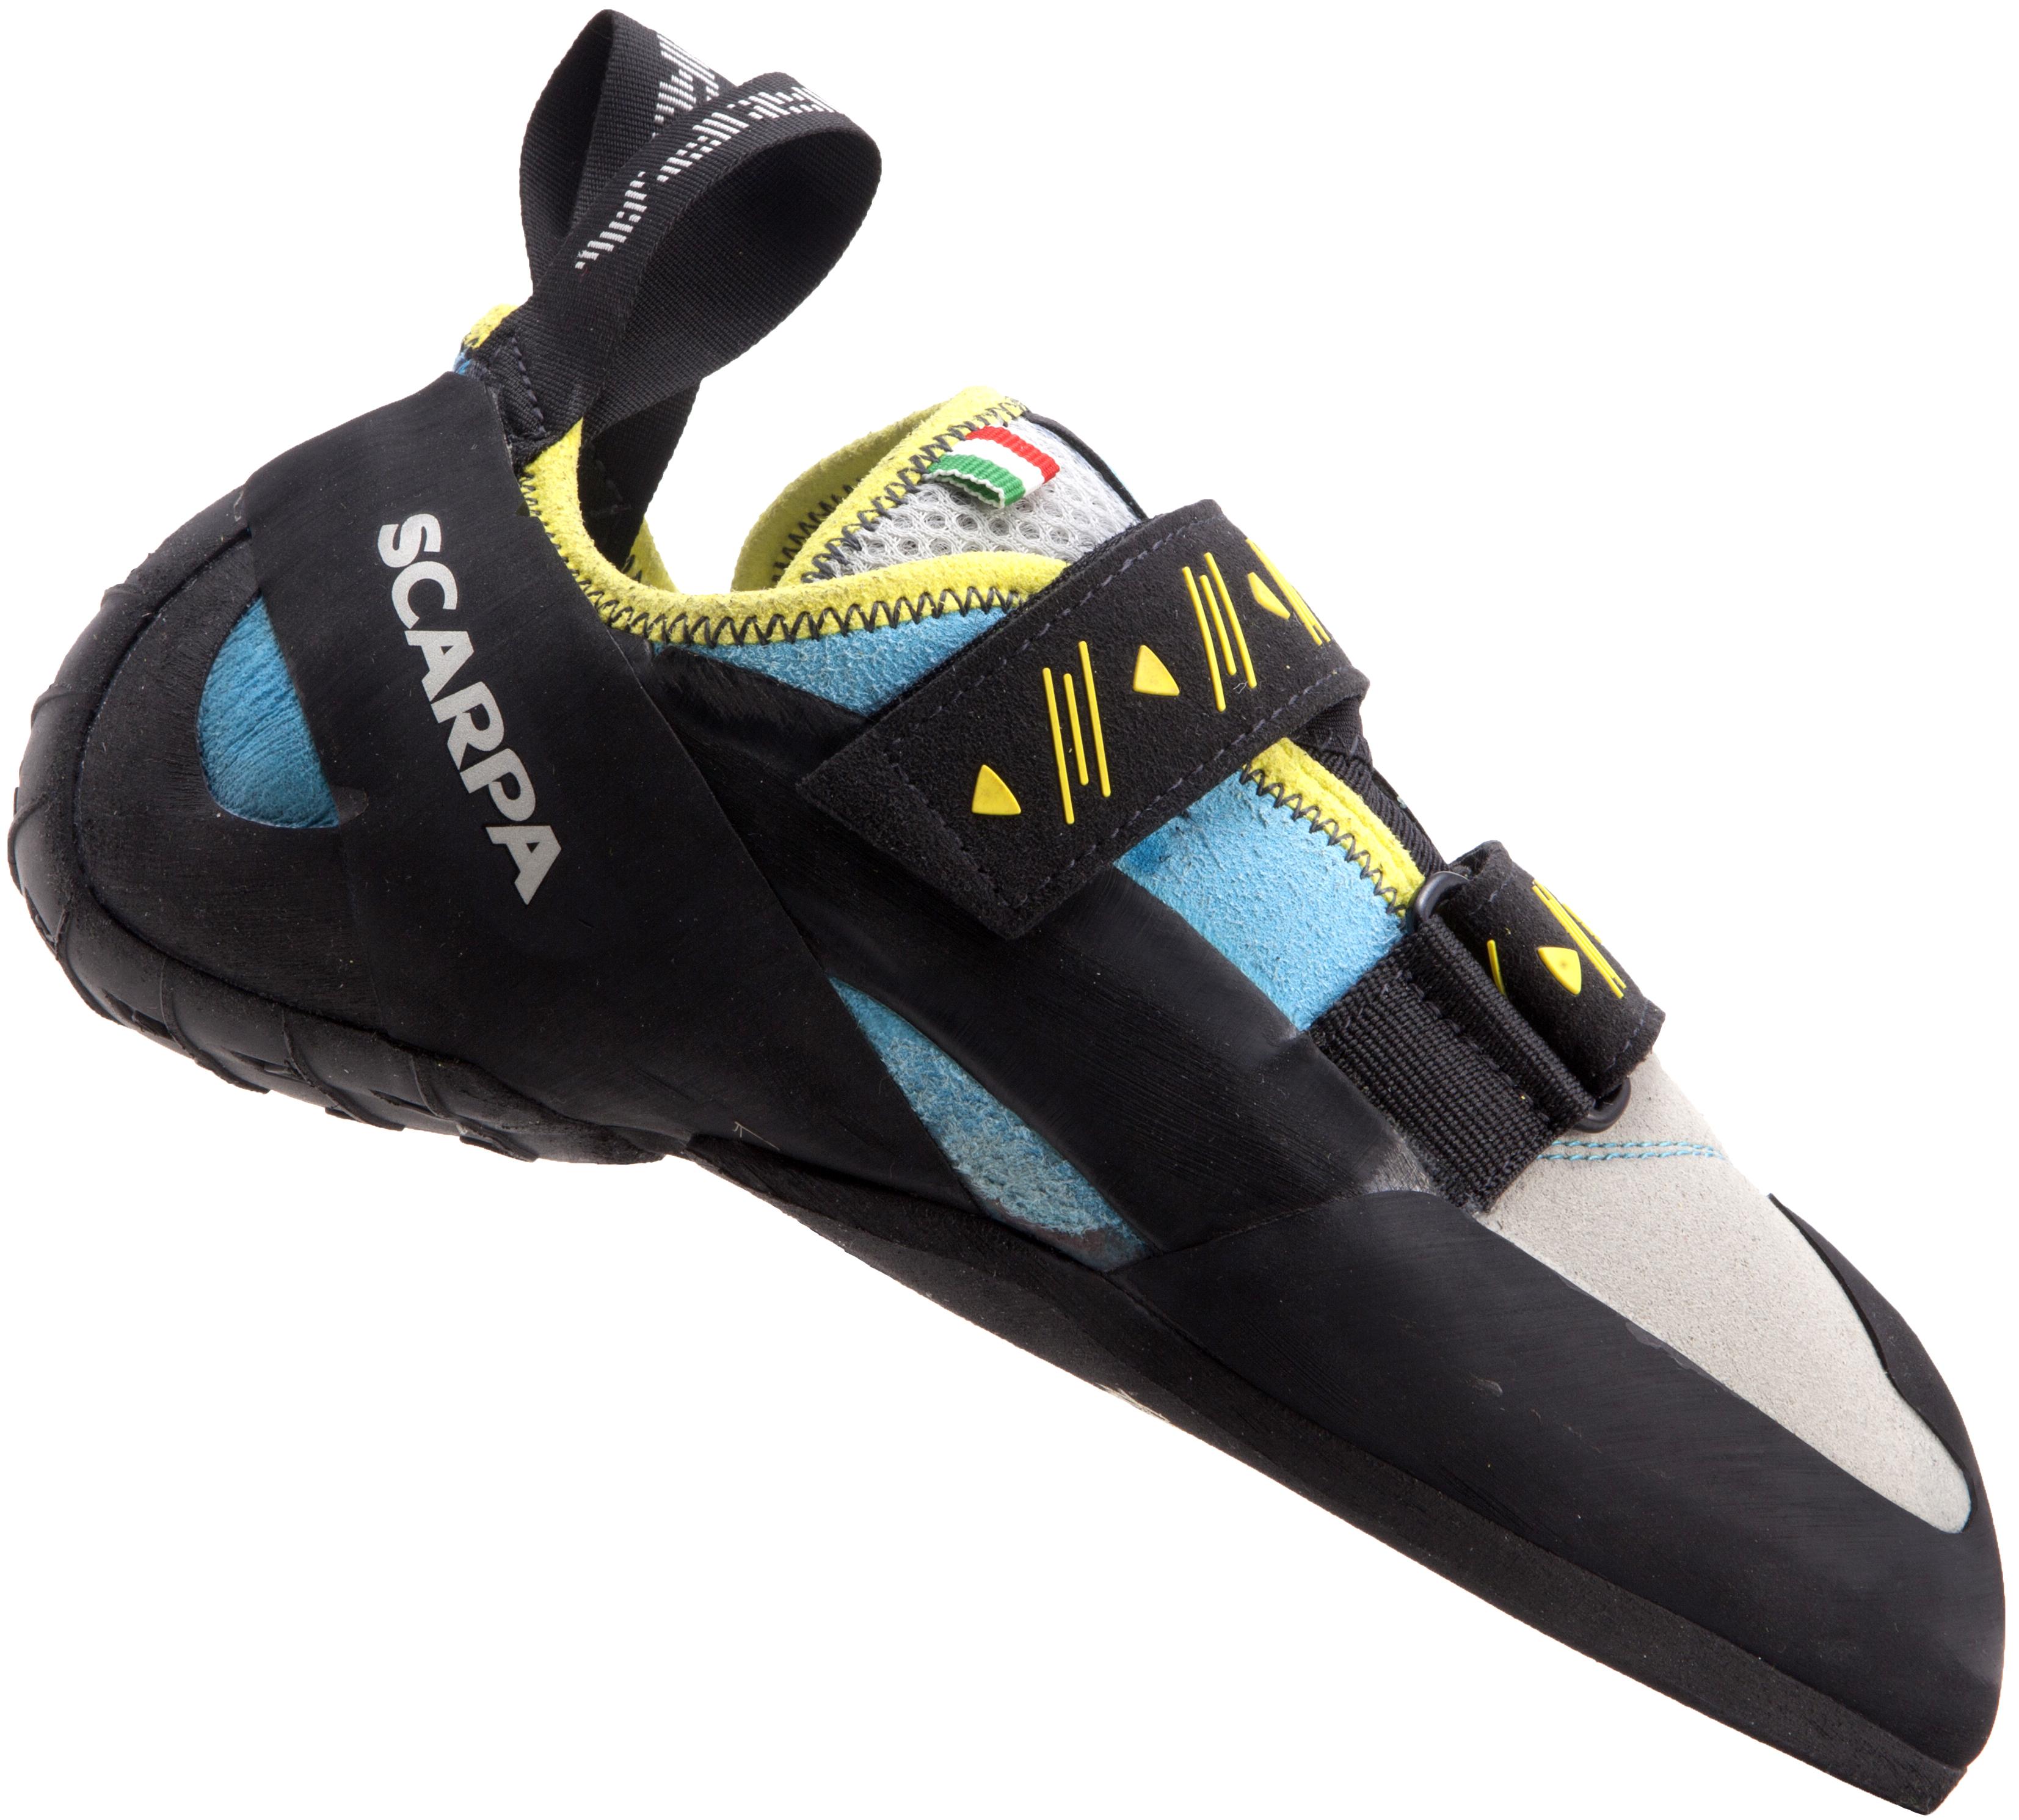 brand new 62a7f 51561 Scarpa Vapor V Rock Shoes - Women's